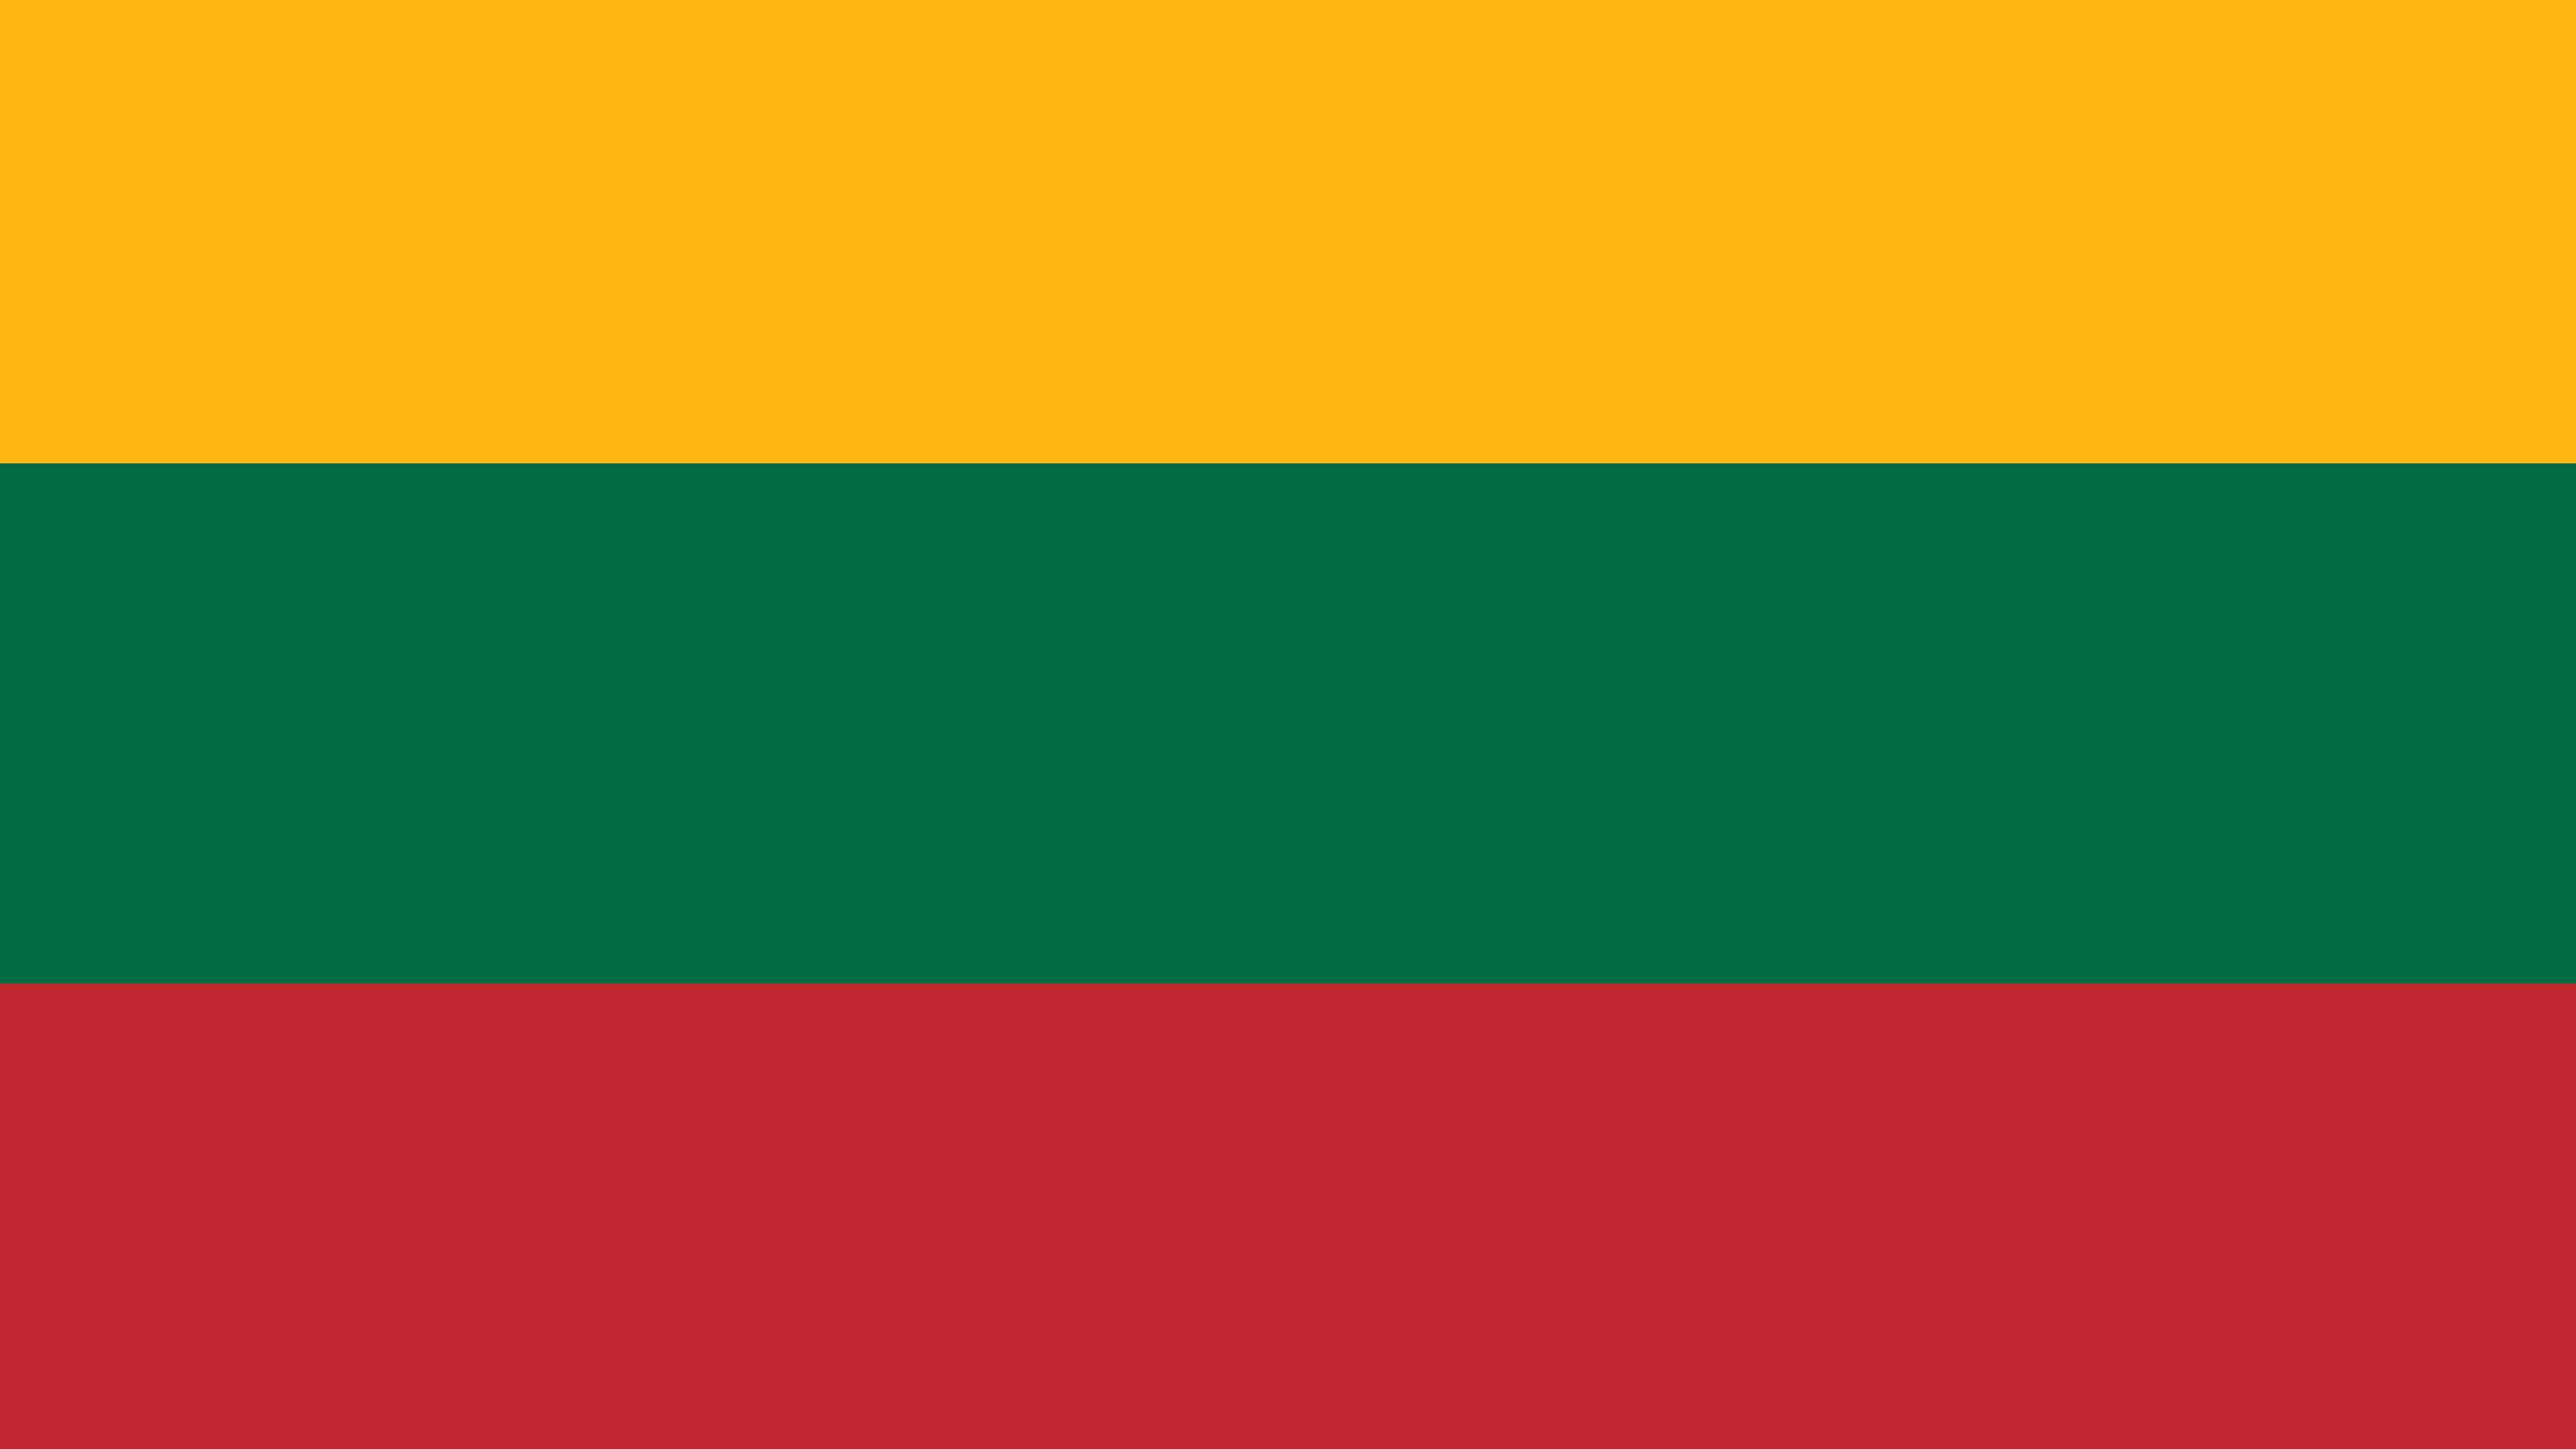 Lithuania Flag UHD 4K Wallpaper Pixelz 3840x2160